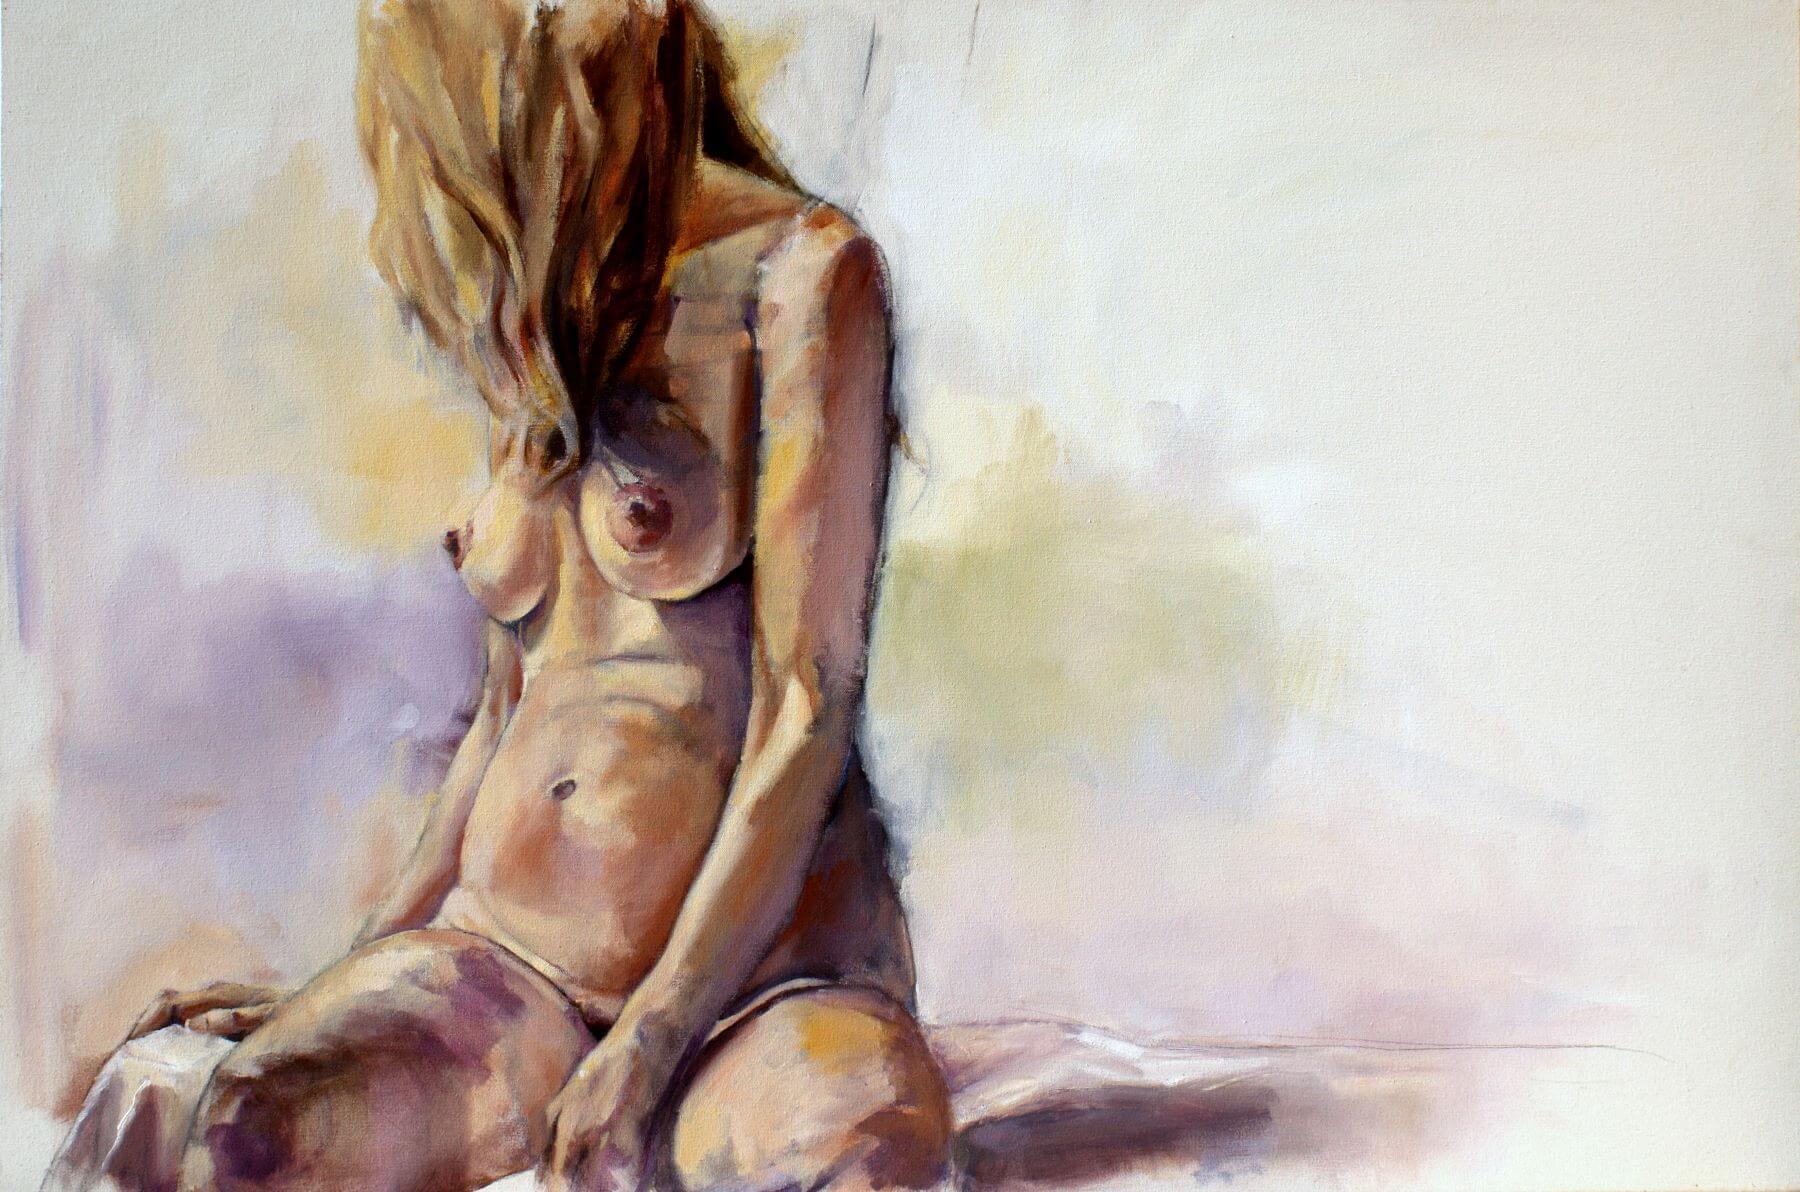 Self portrait - painting, acrylic on canvas by artist Neva Bergemann